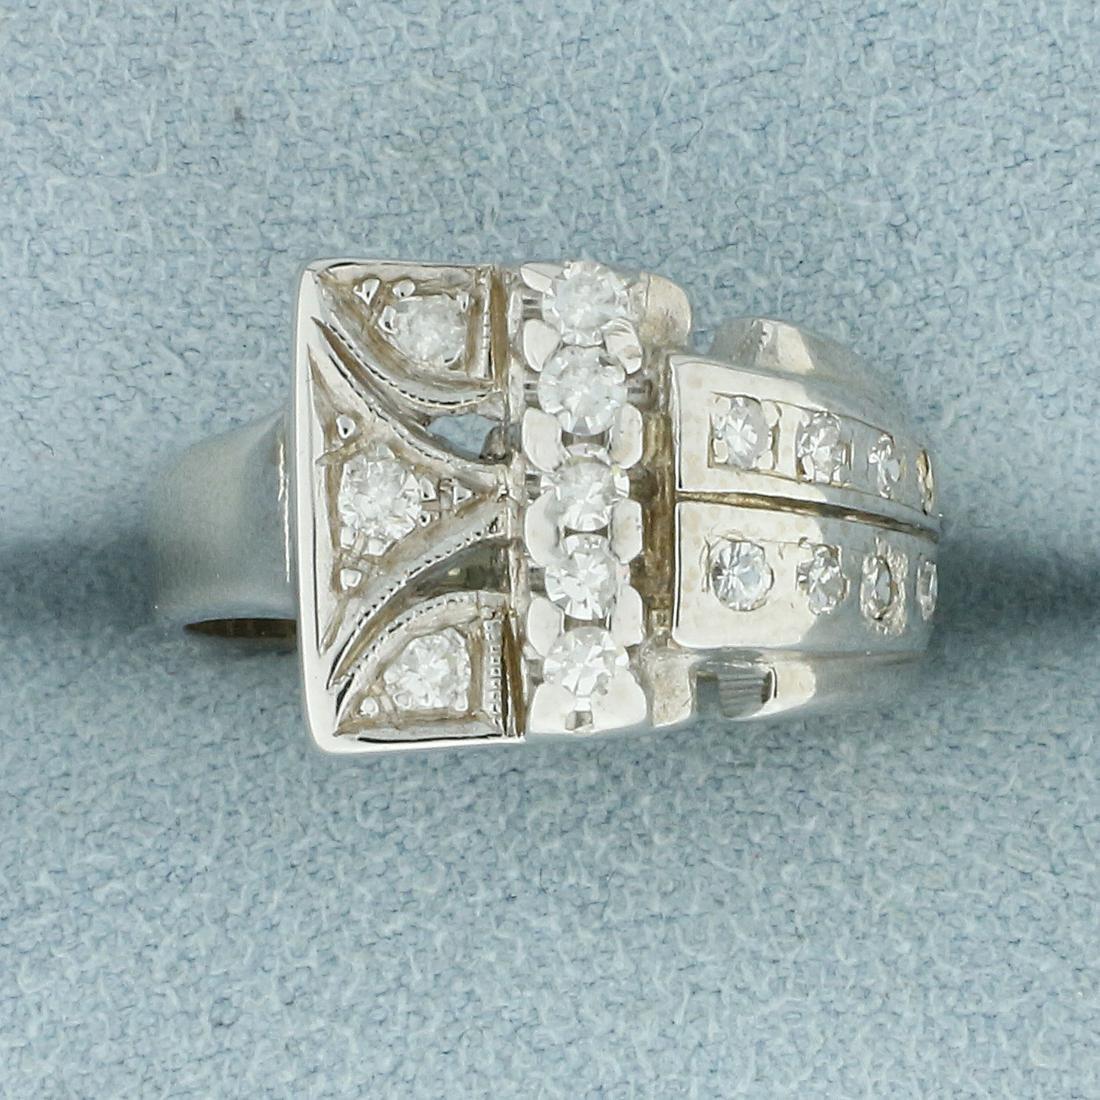 Vintage 1/3ct TW Diamond Ring in 14K White Gold